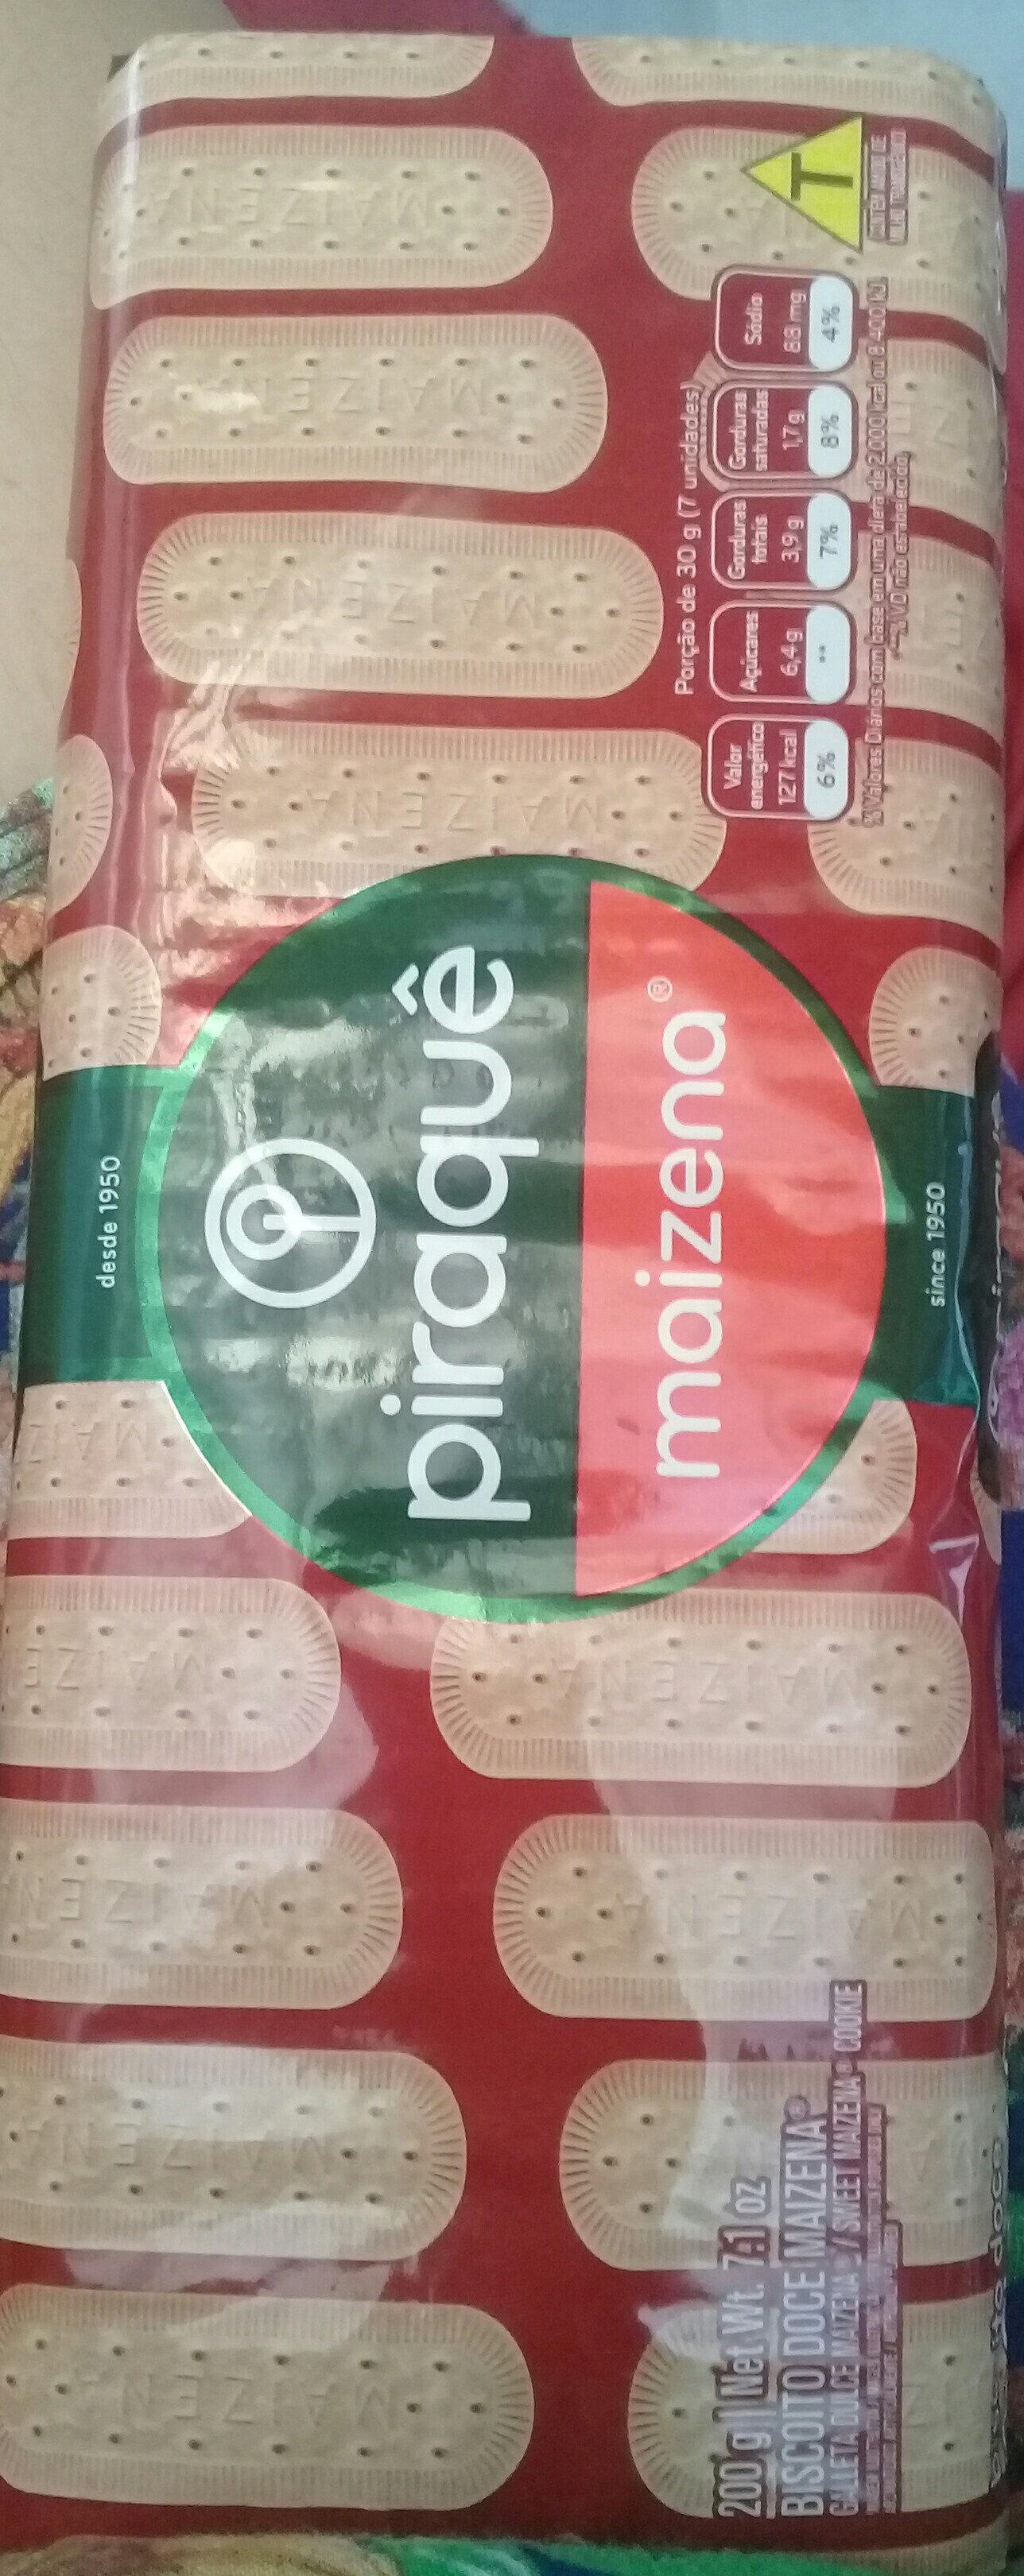 Biscoito doce maizena - Produto - pt